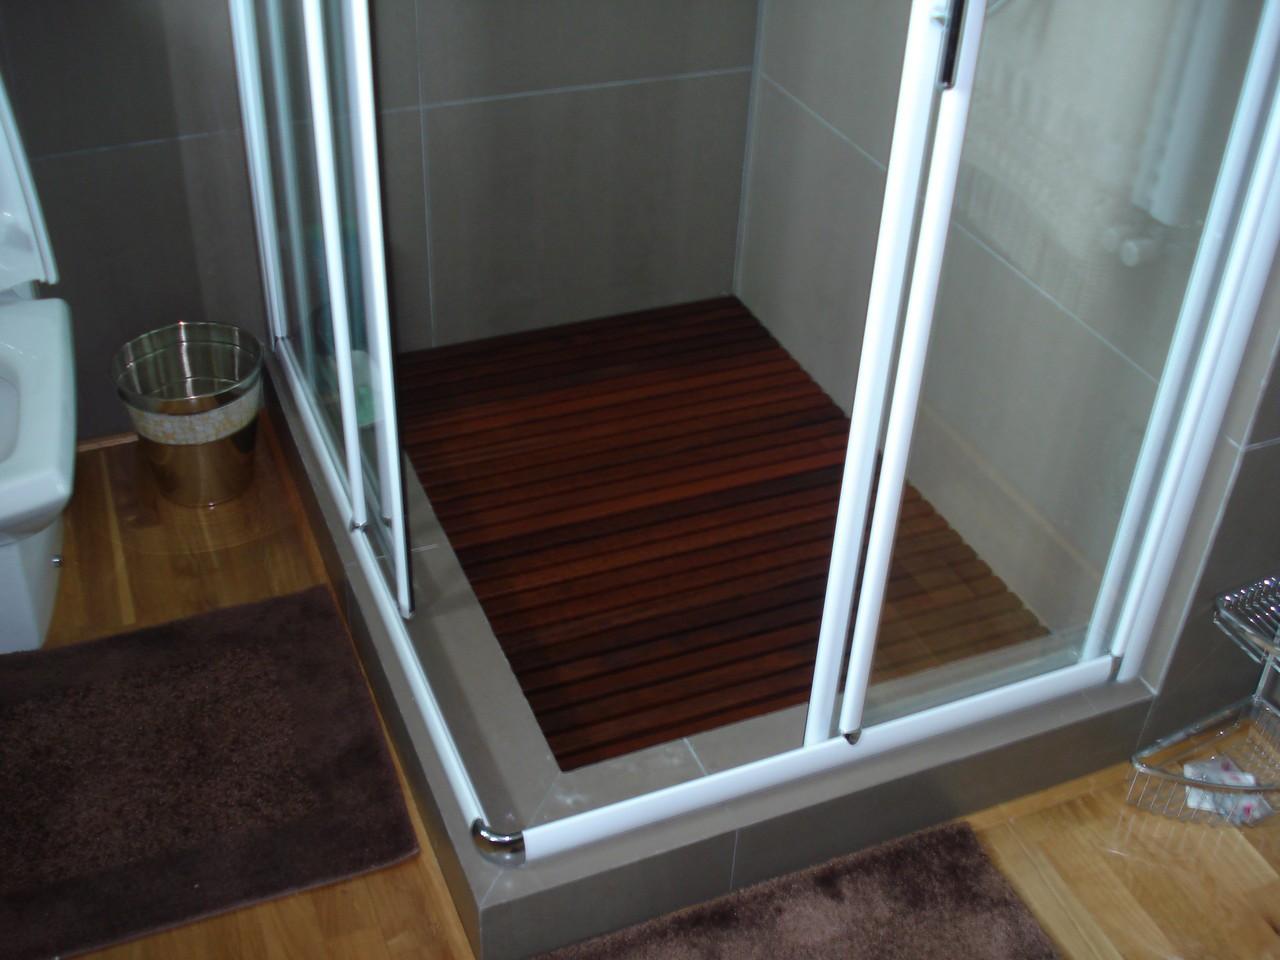 Deck De Madeira Chuveiro Box Banheiro Capacho 127x71 cm Sem Pintura somente lixado